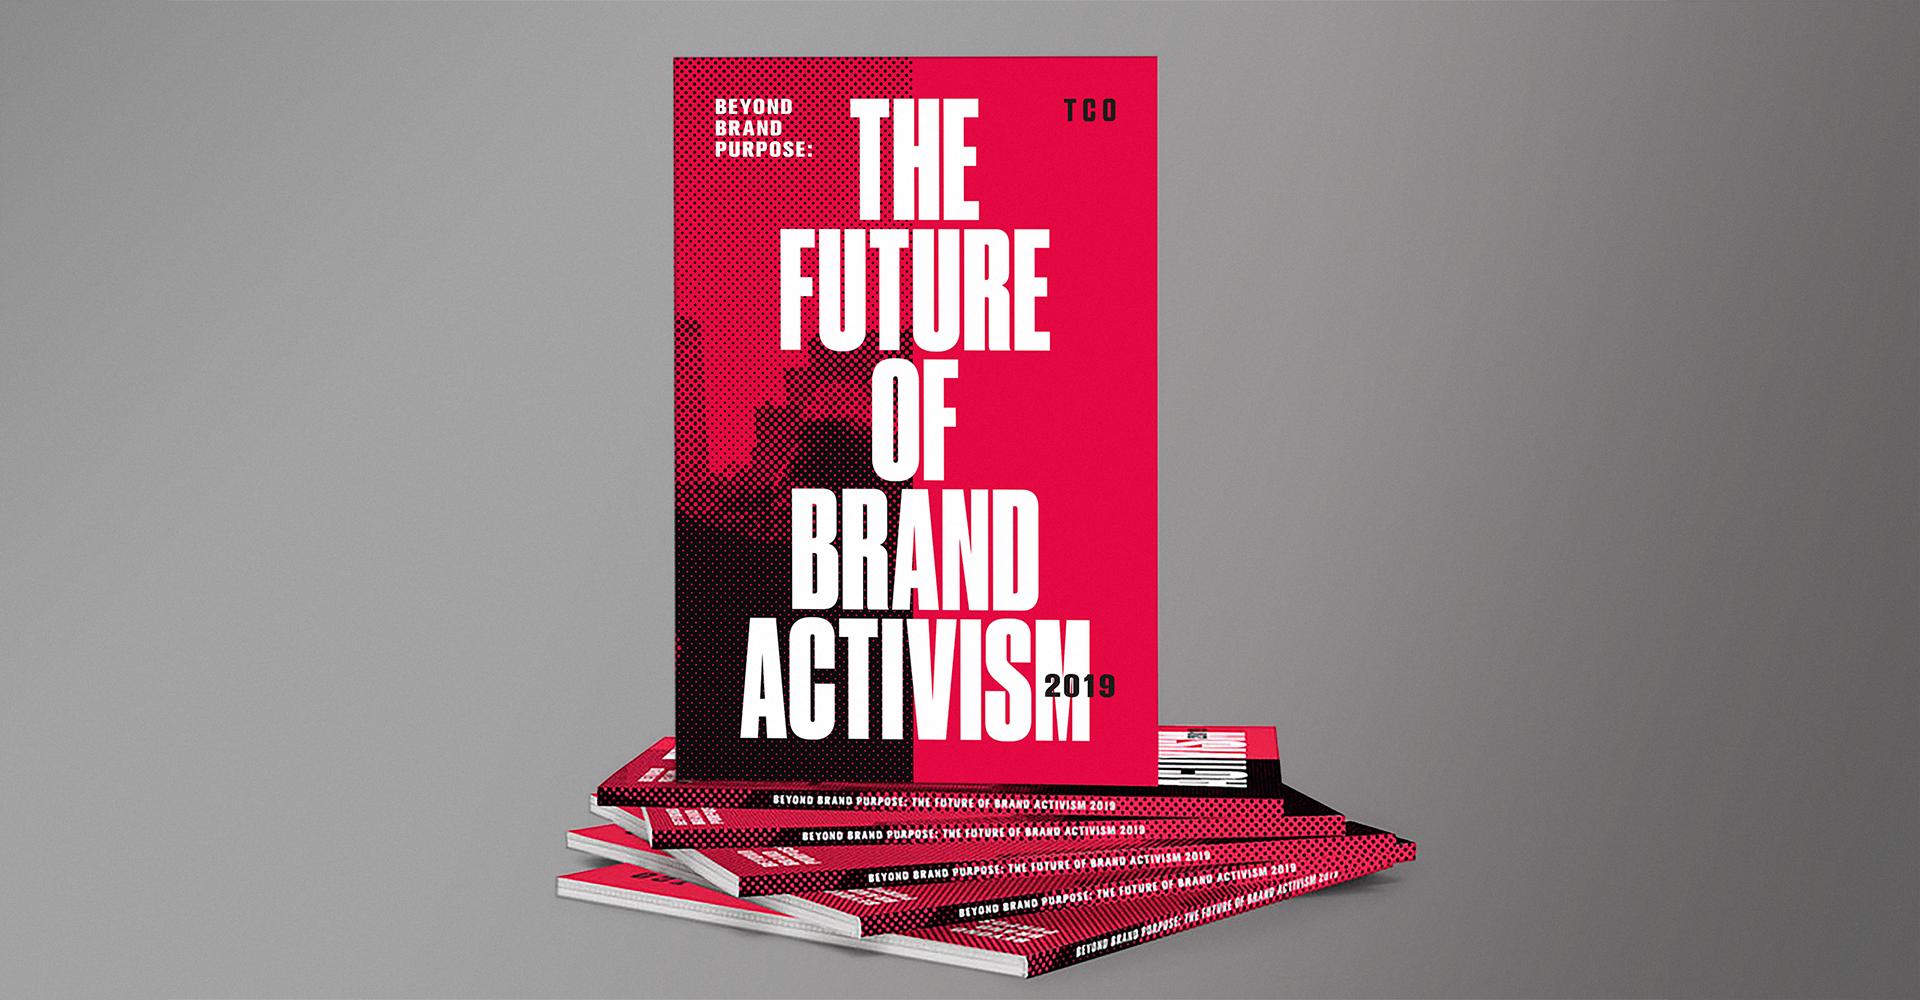 TCO London Brand Purpose Consultancy Report.png